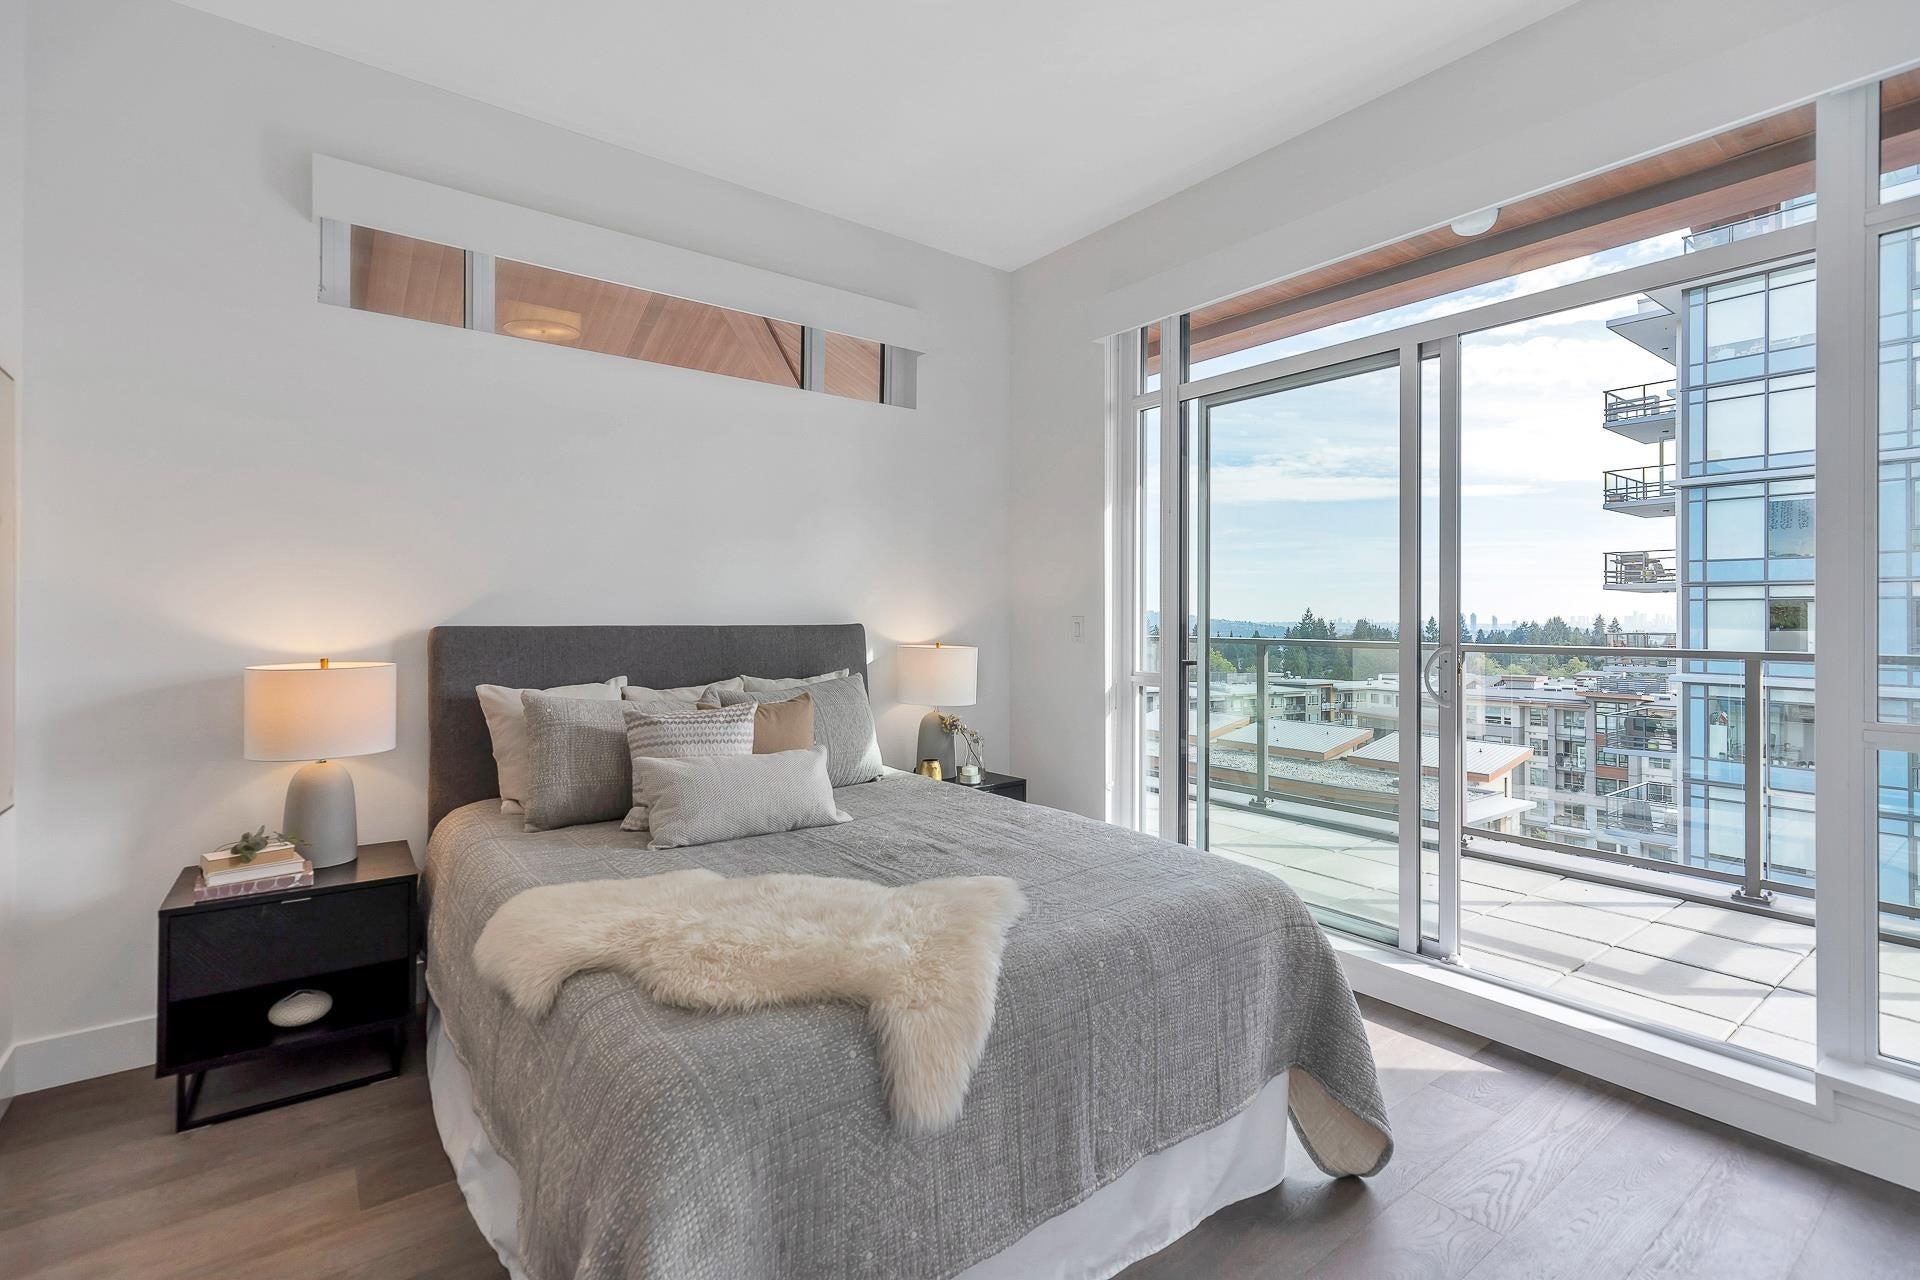 702 2780 VALLEY CENTRE AVENUE - Lynn Valley Apartment/Condo for sale, 3 Bedrooms (R2622279) - #16